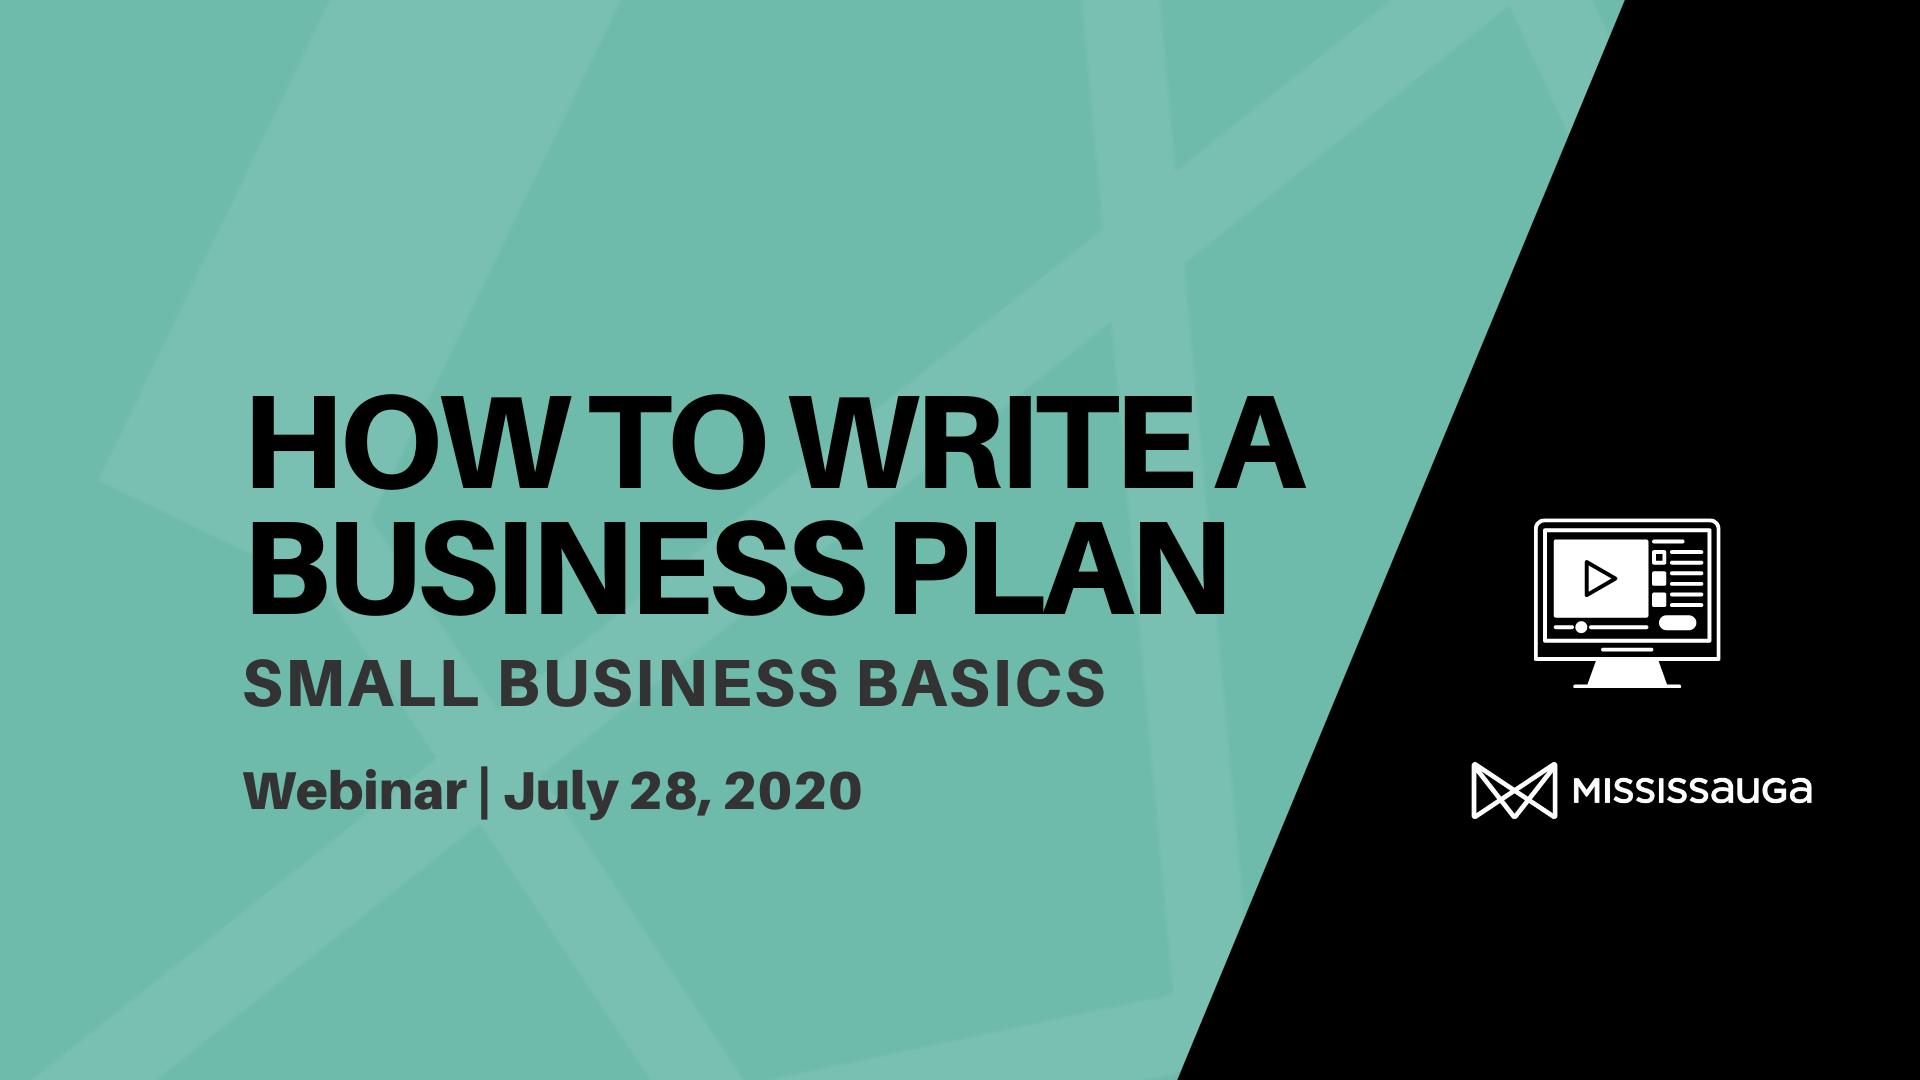 How to Write a Business Plan – Webinar, Jul 28